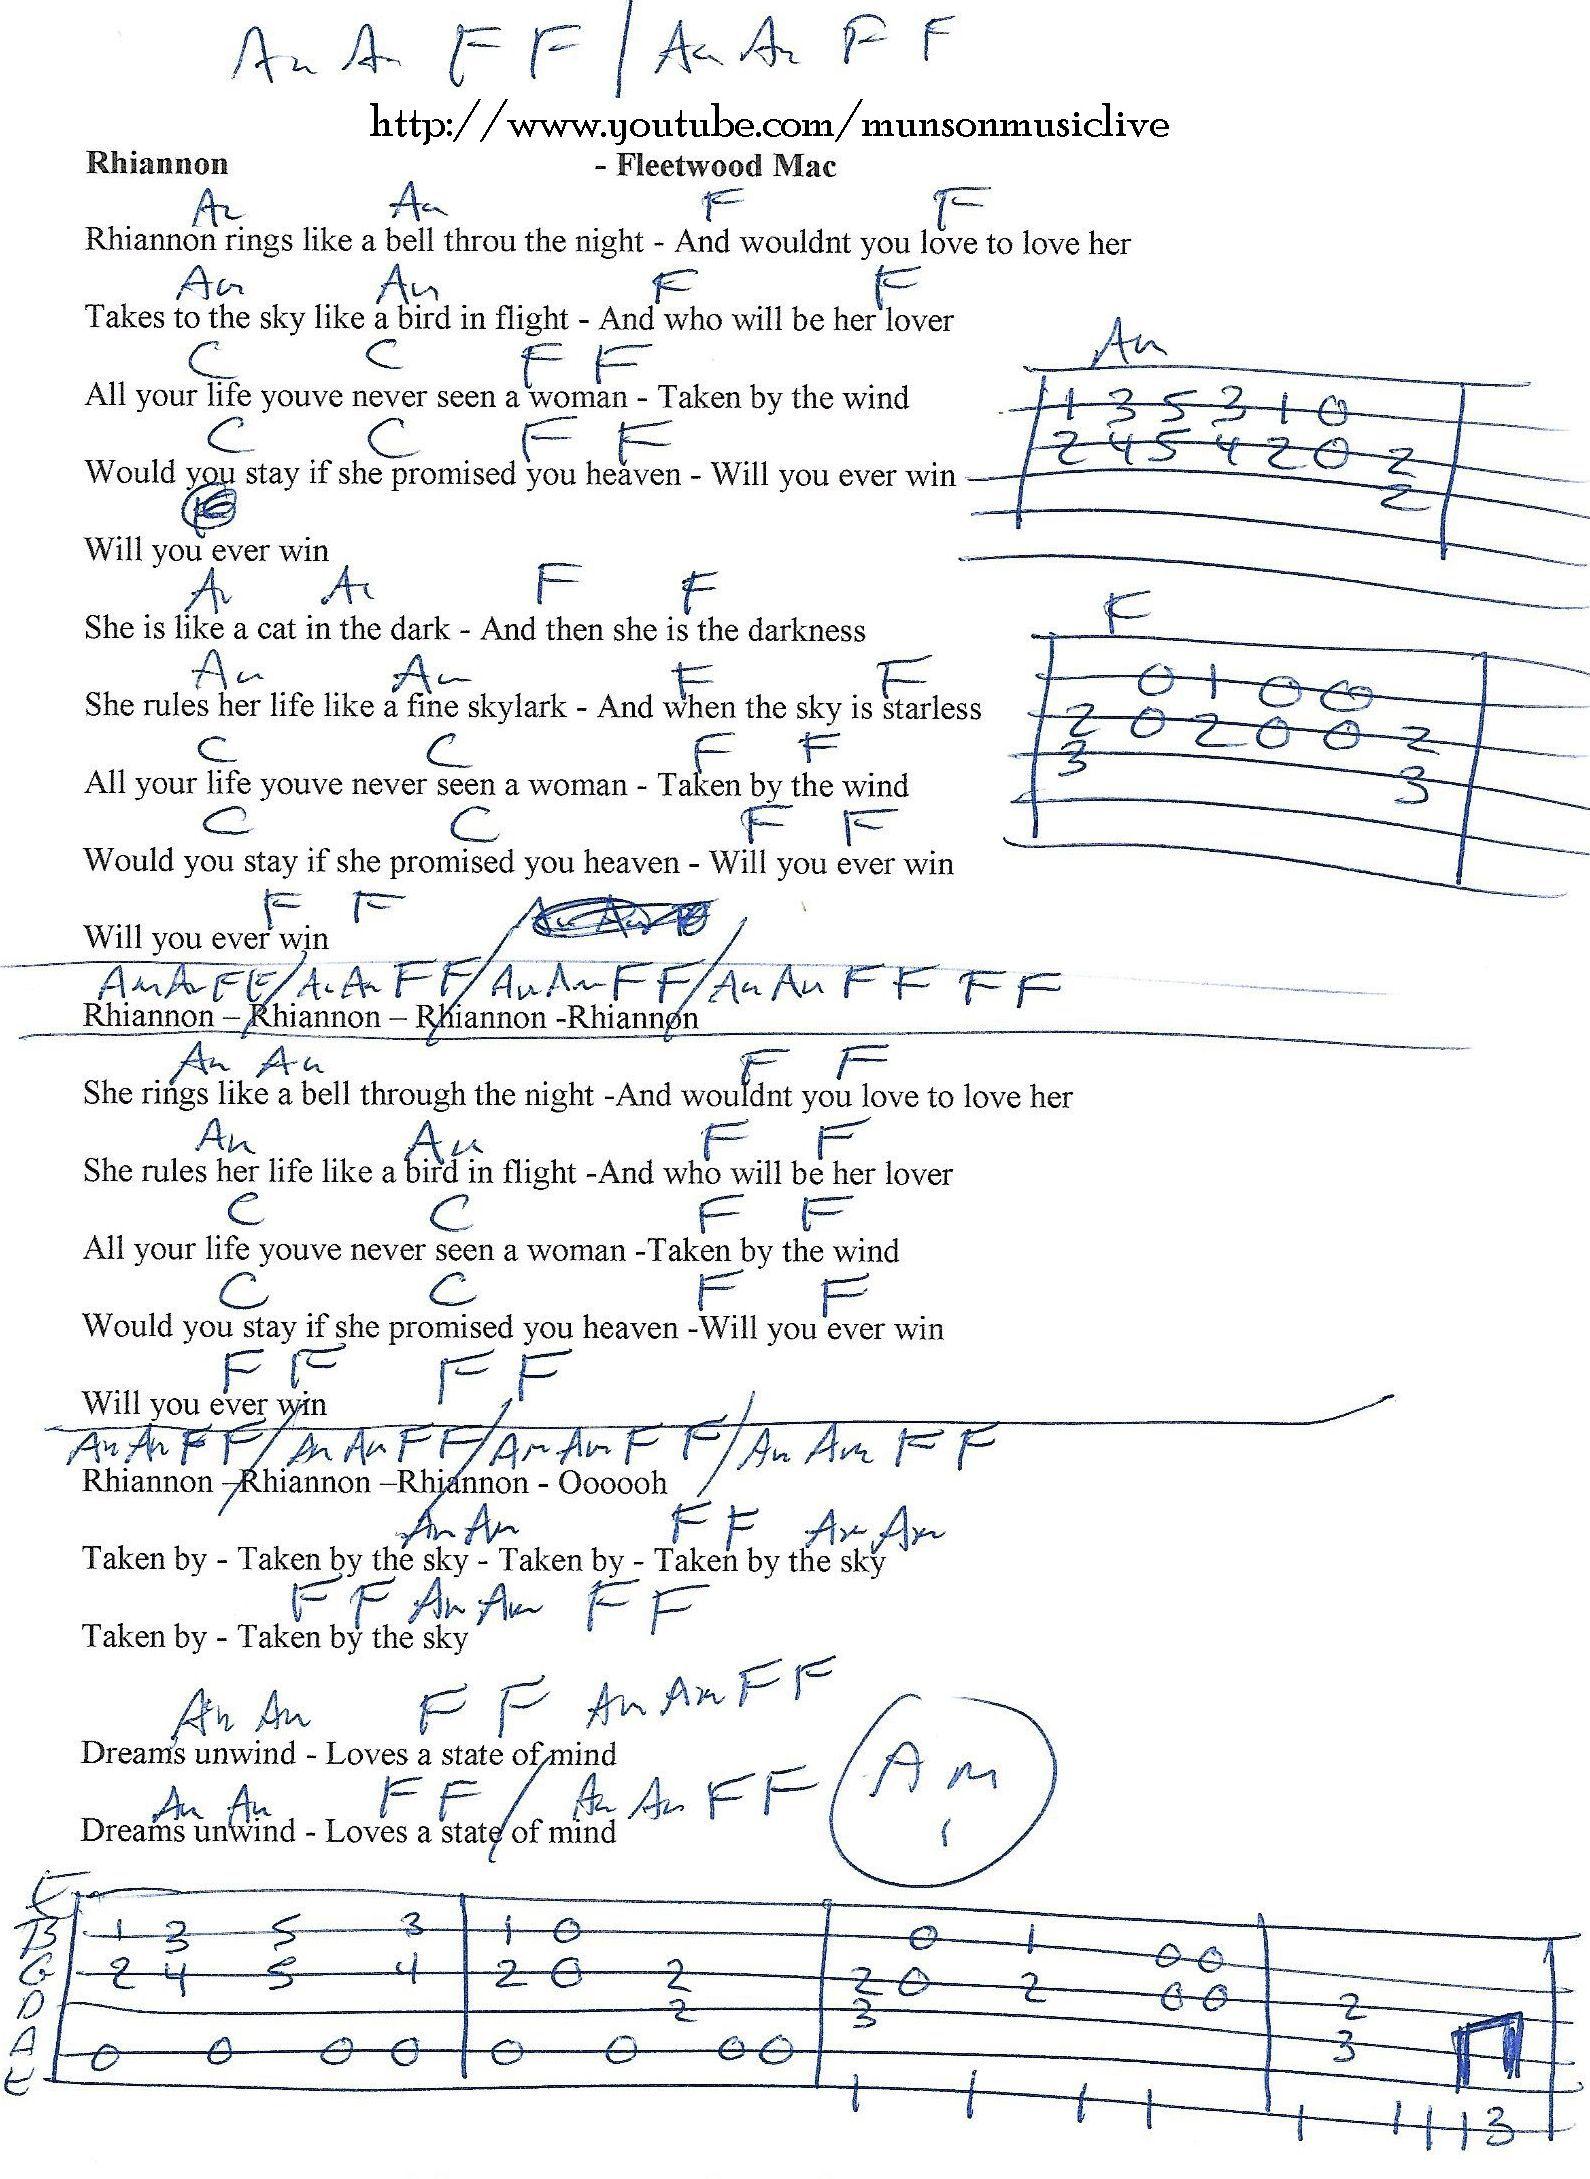 Rhiannon fleetwood mac guitar chord chart singing lessons rhiannon fleetwood mac guitar chord chart hexwebz Choice Image